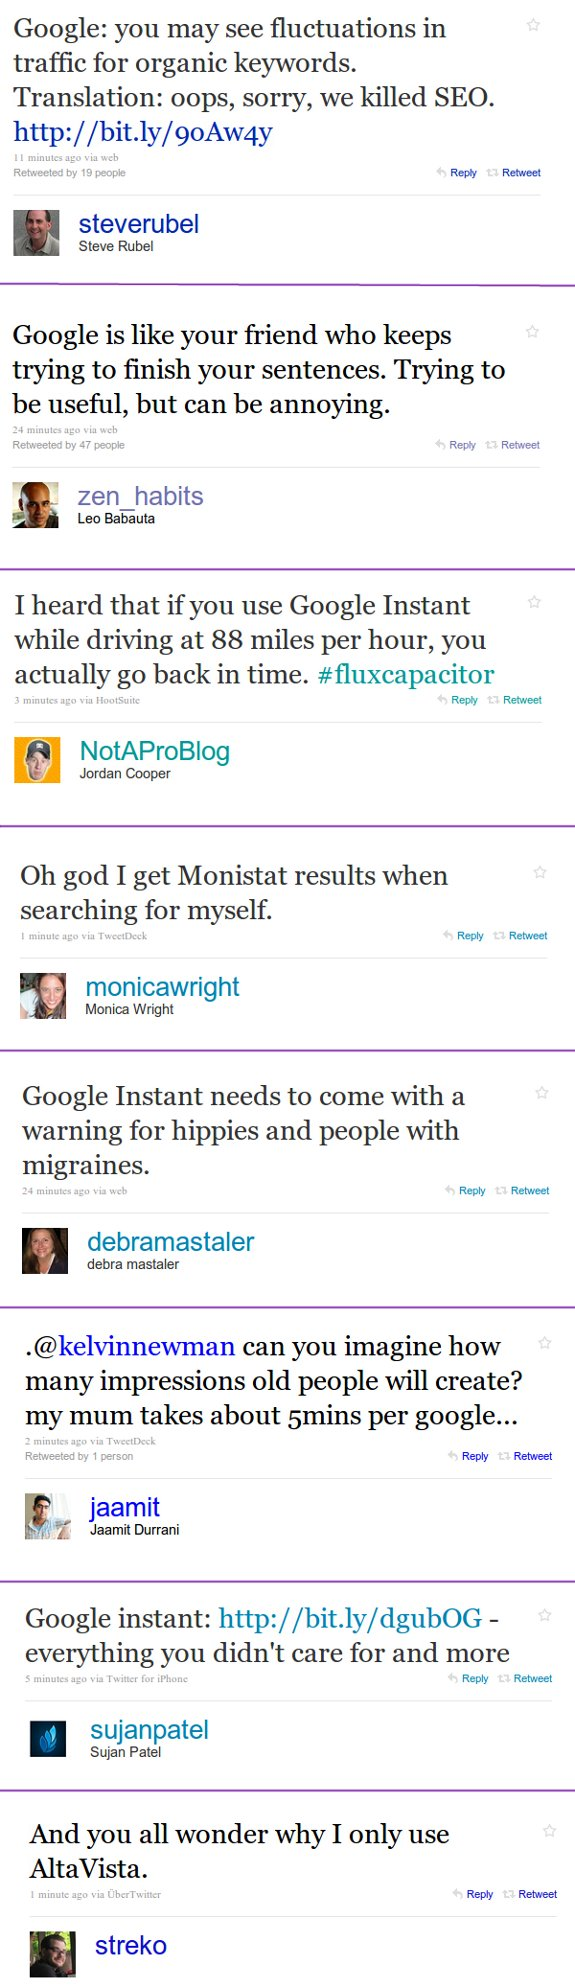 google instant on twitter